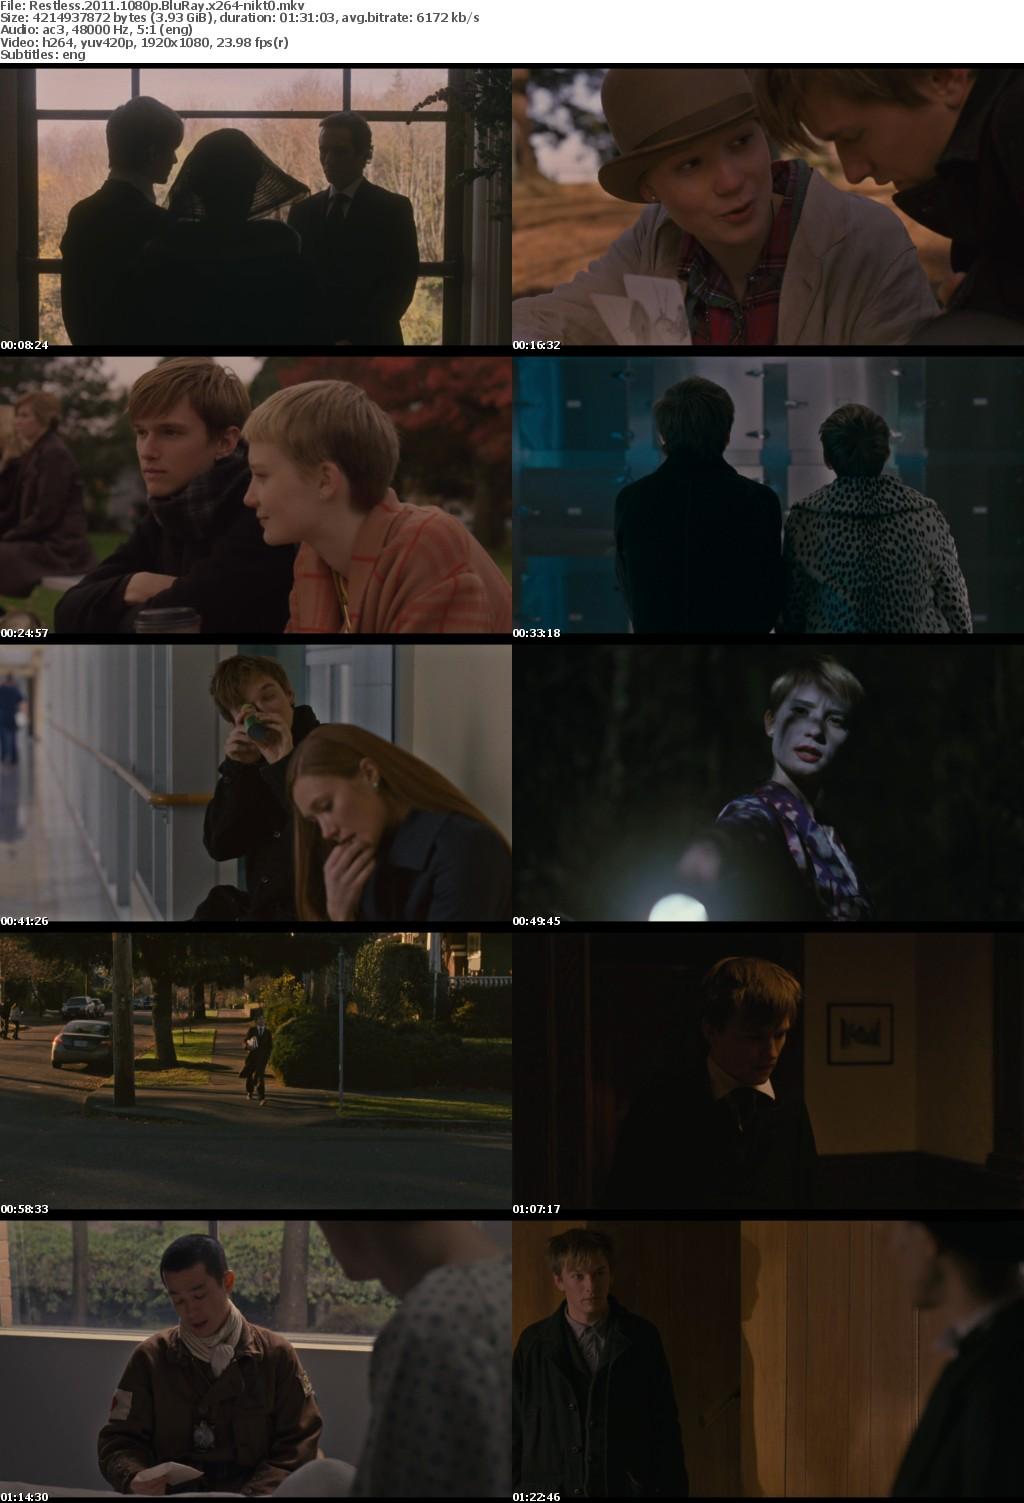 Restless 2011 1080p BluRay x264-nikt0